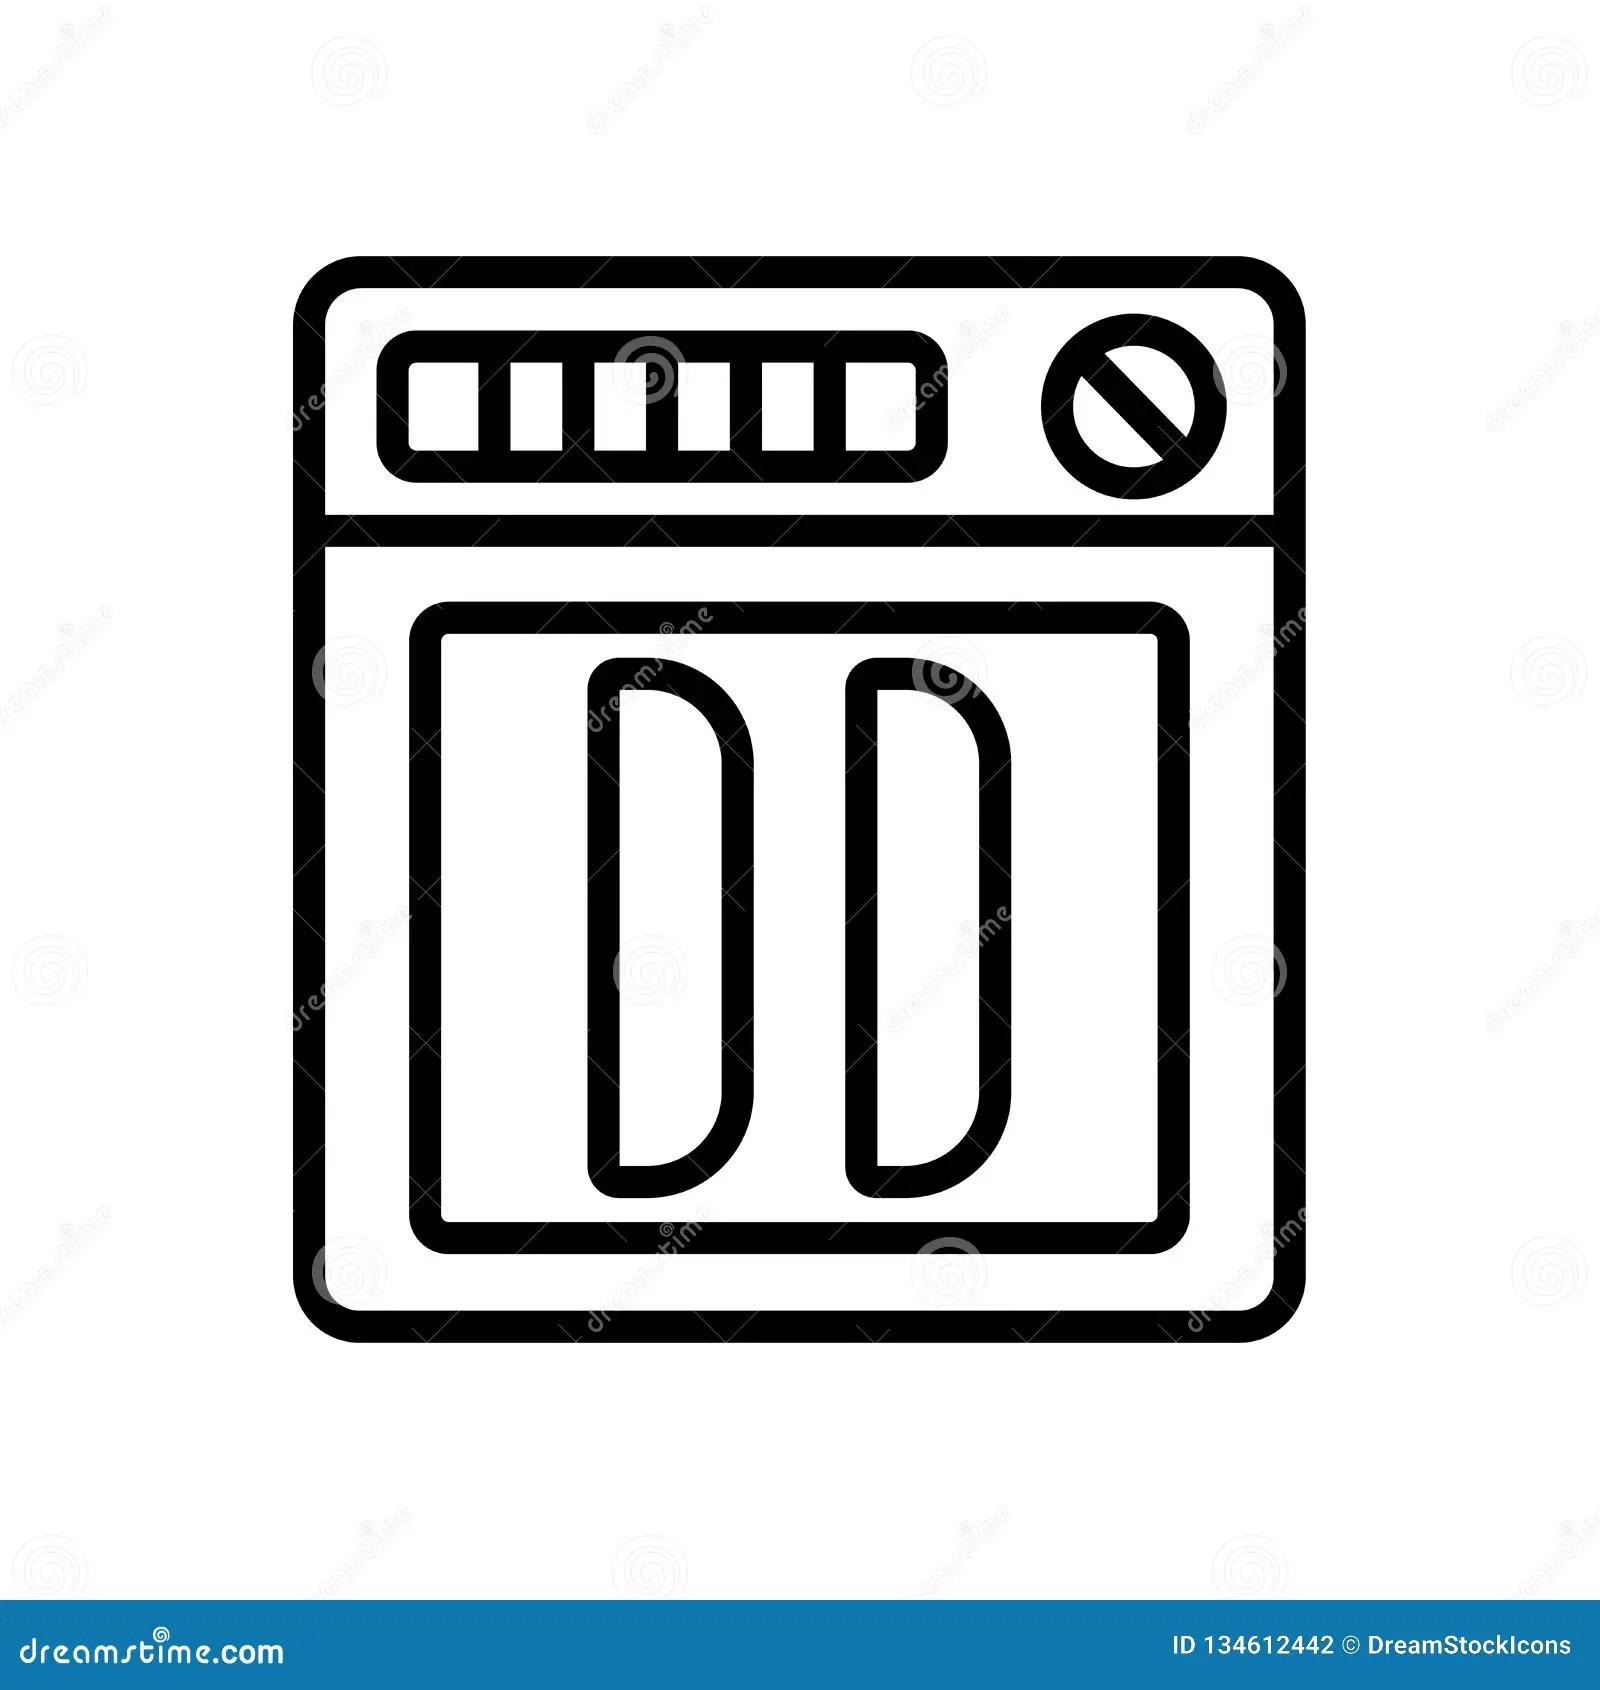 dishwasher icon vector isolated